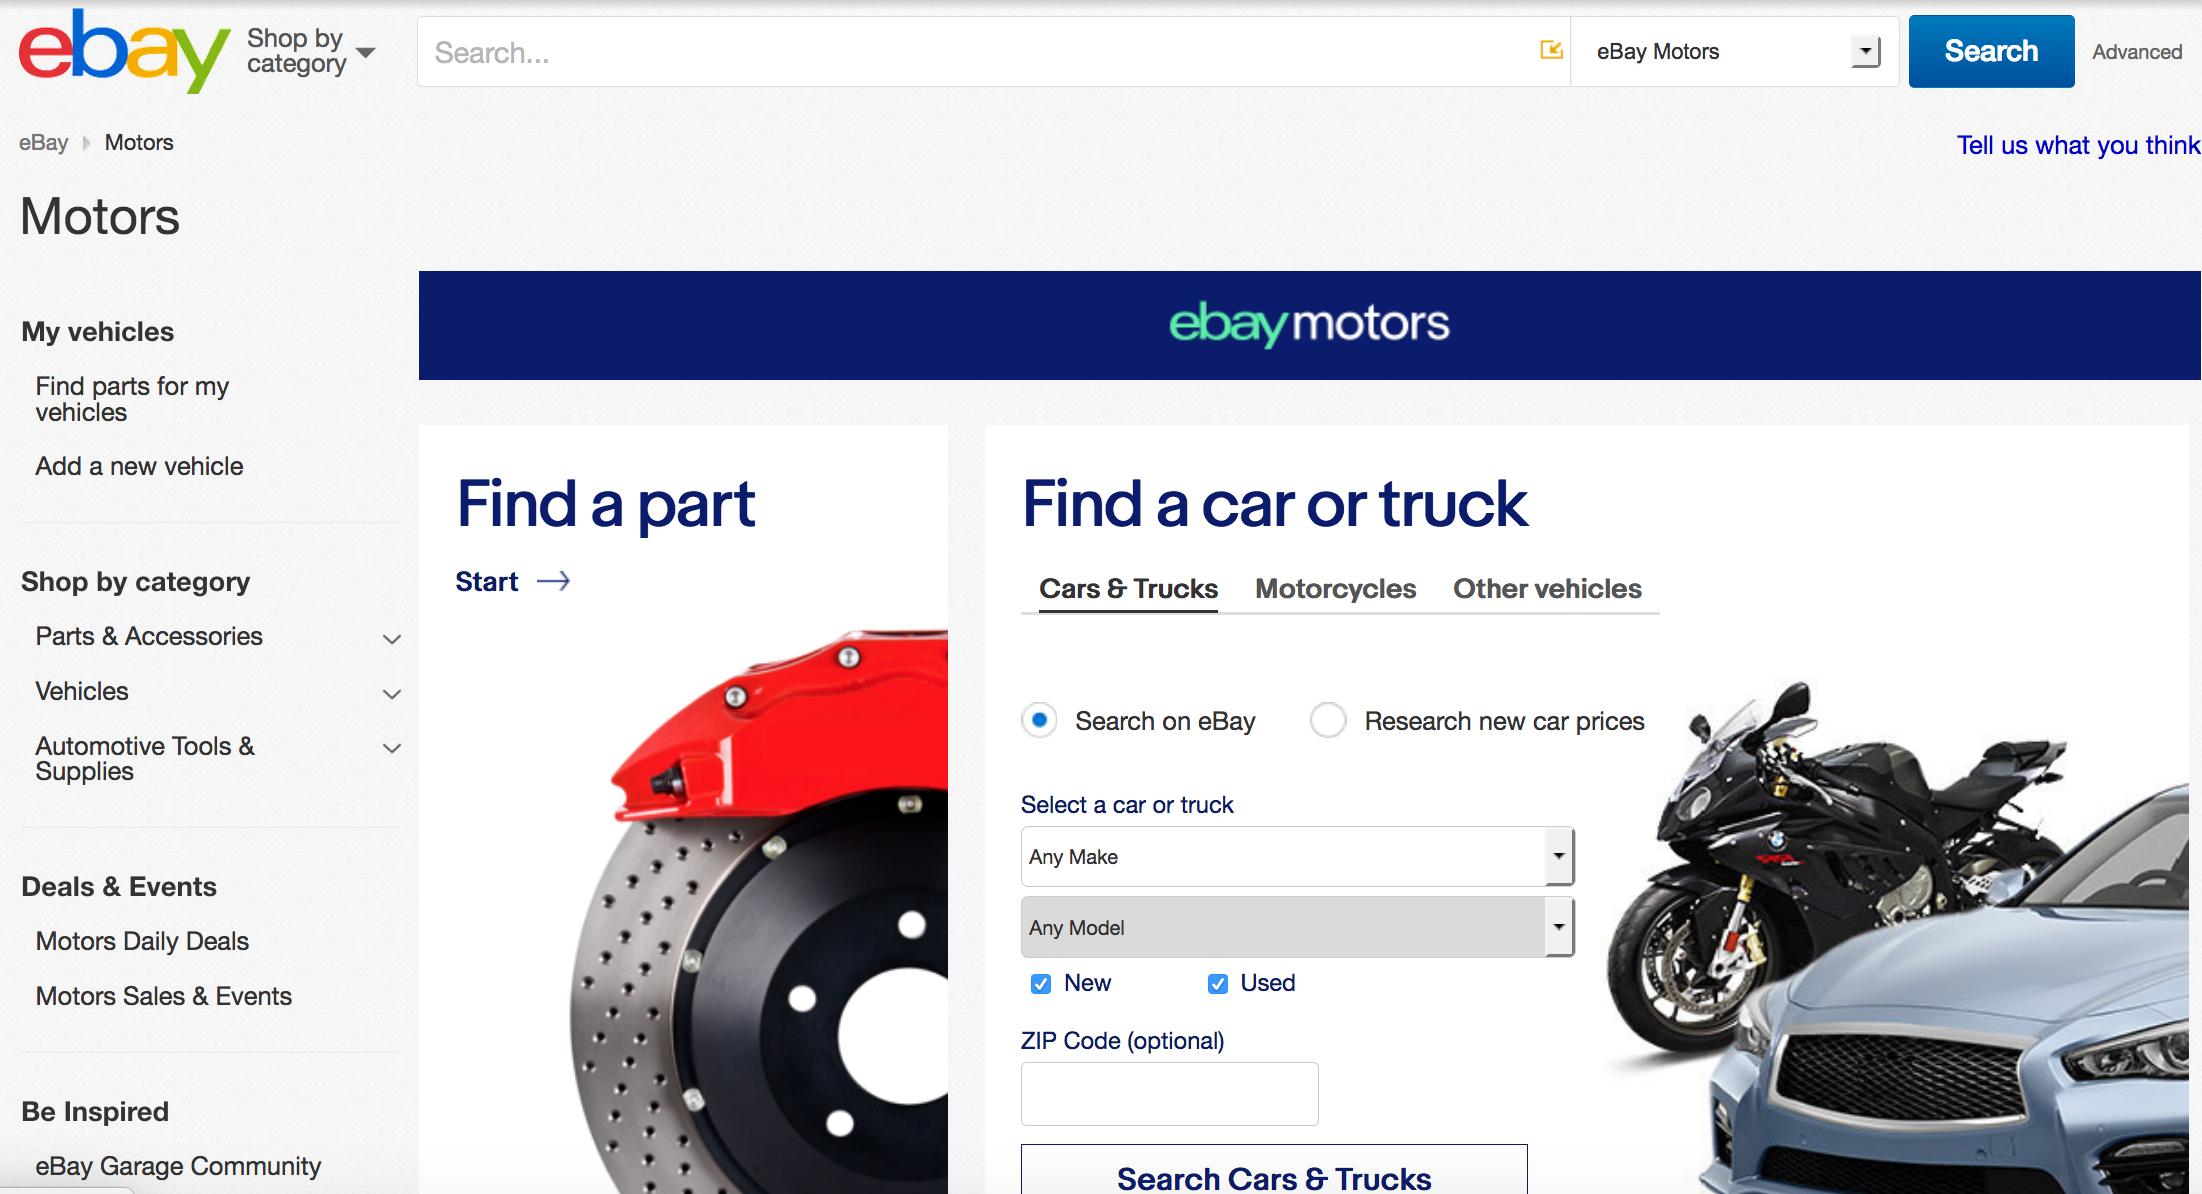 eBay Taps TrueCar Services for New Car Buying Program | Fleet News Daily